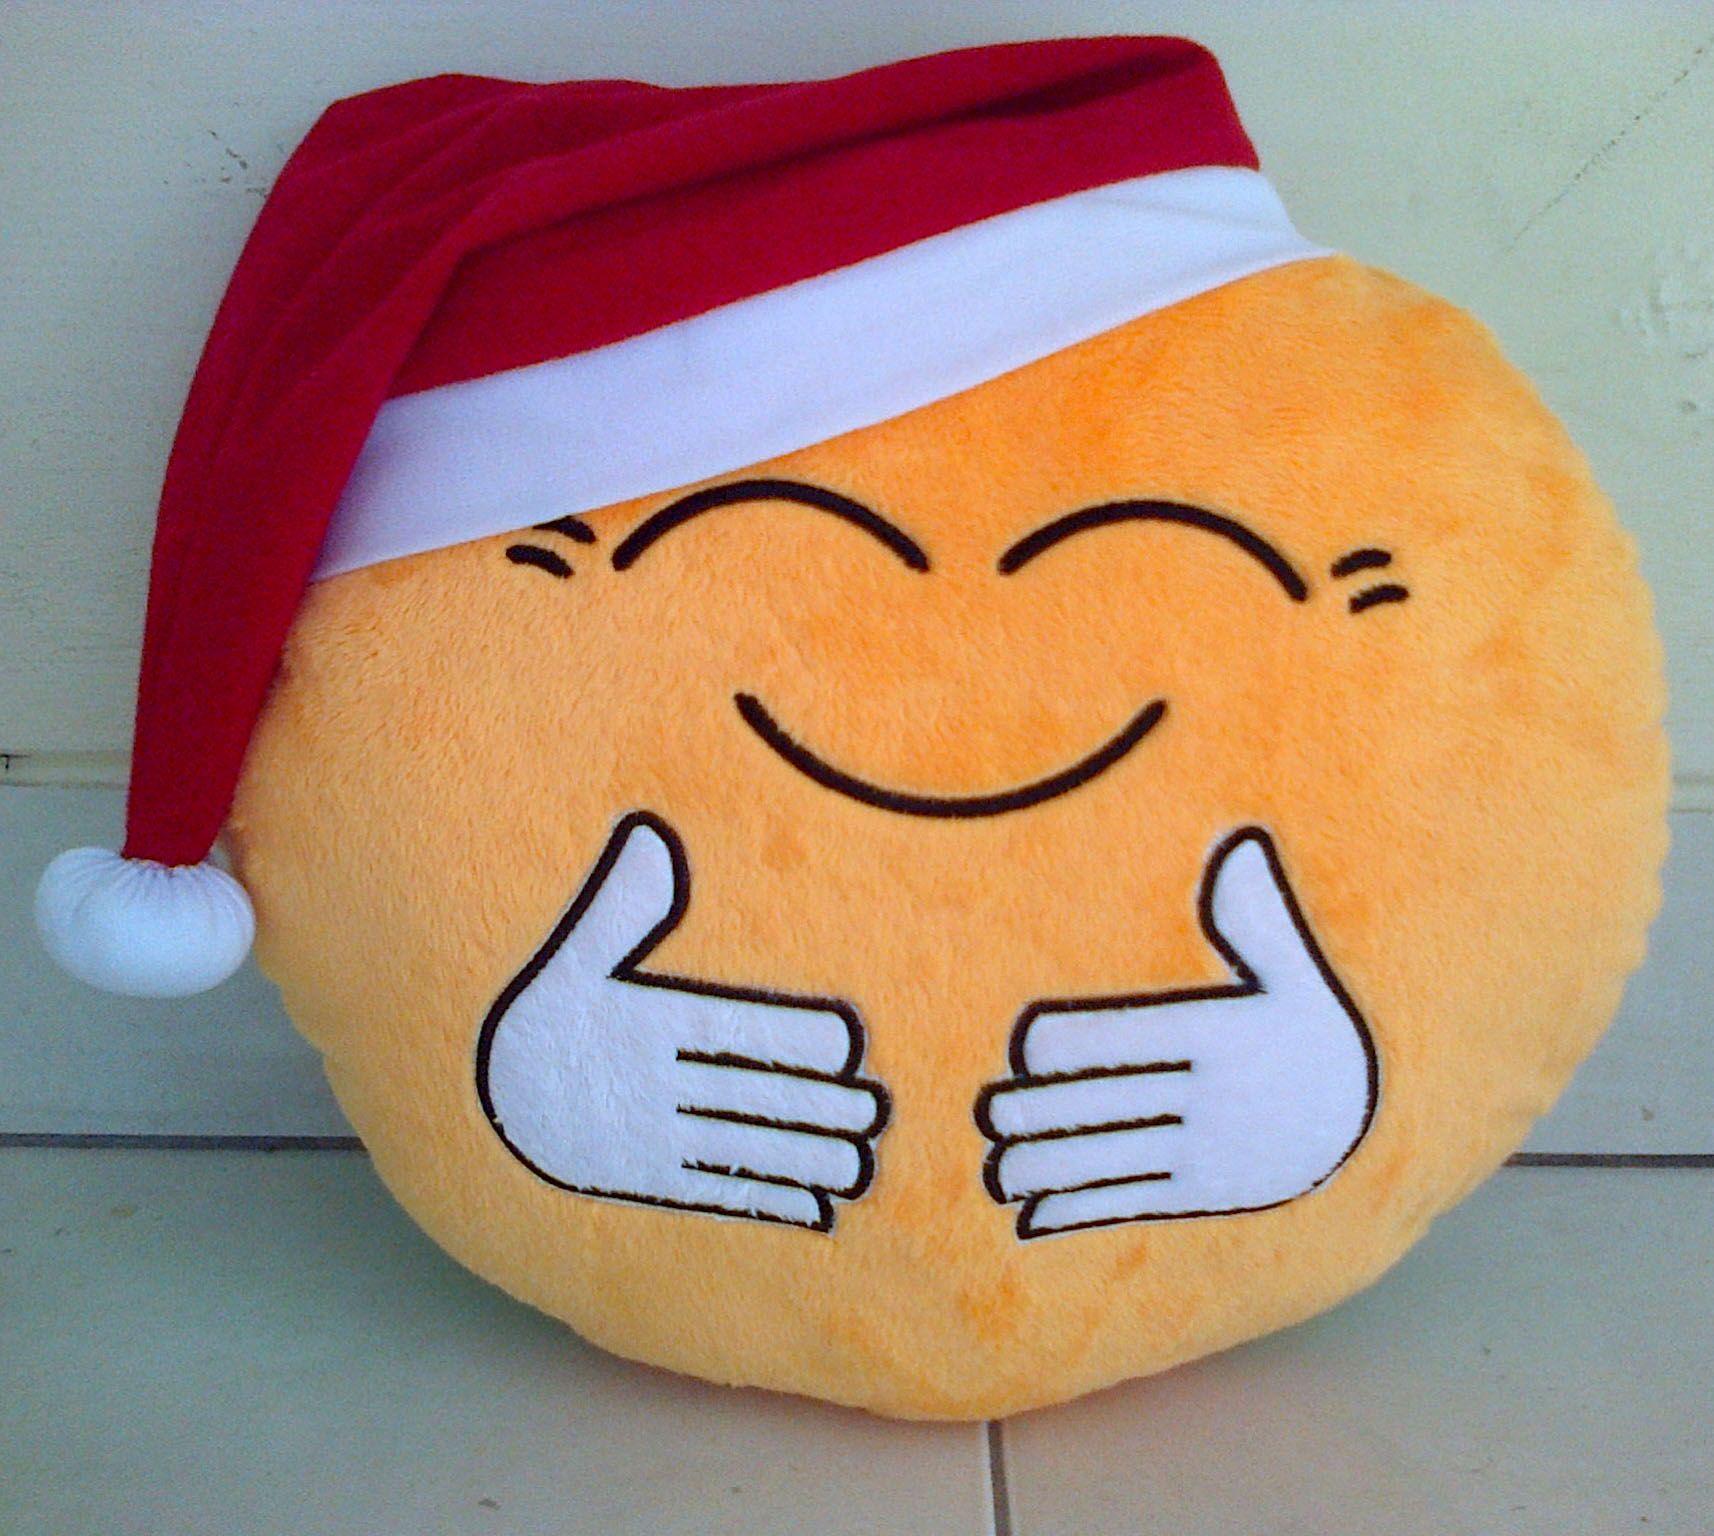 Bantal Natal Katun Dapat Dijadikan Hadiah Natal Untuk Anak Anak